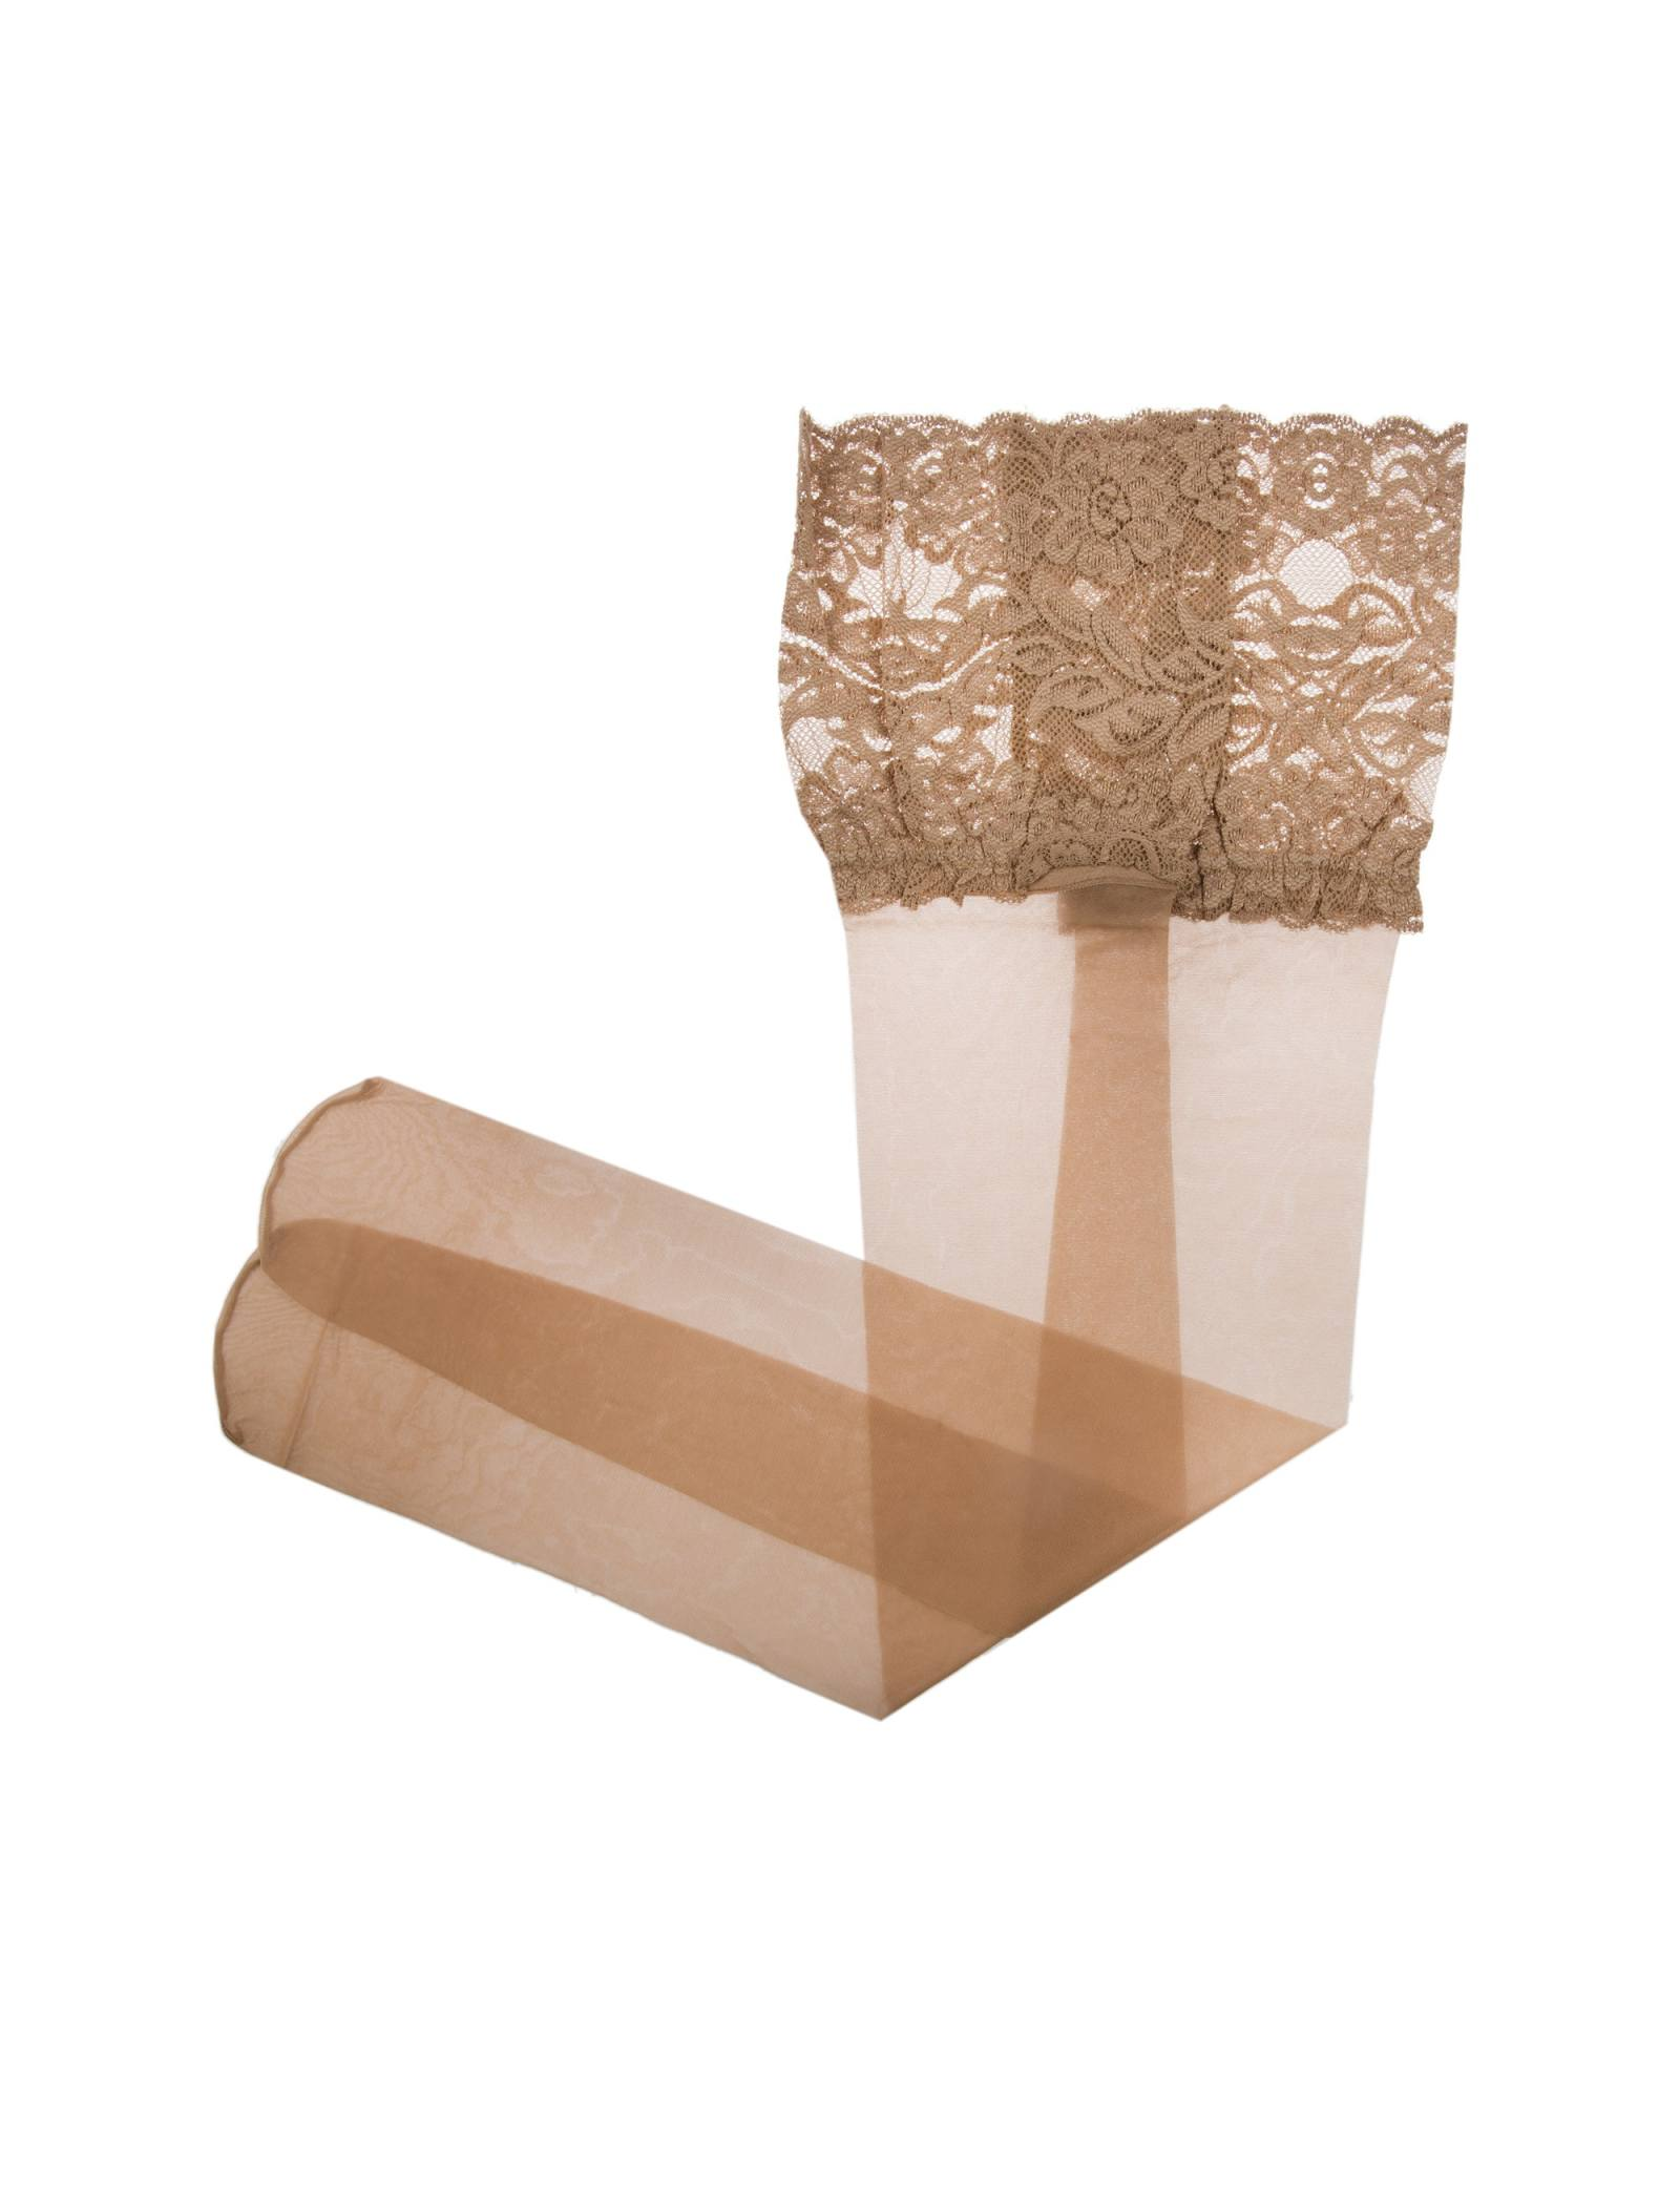 جوراب ساق بلند زنانه - لاوین رز - رنگ پا - 2